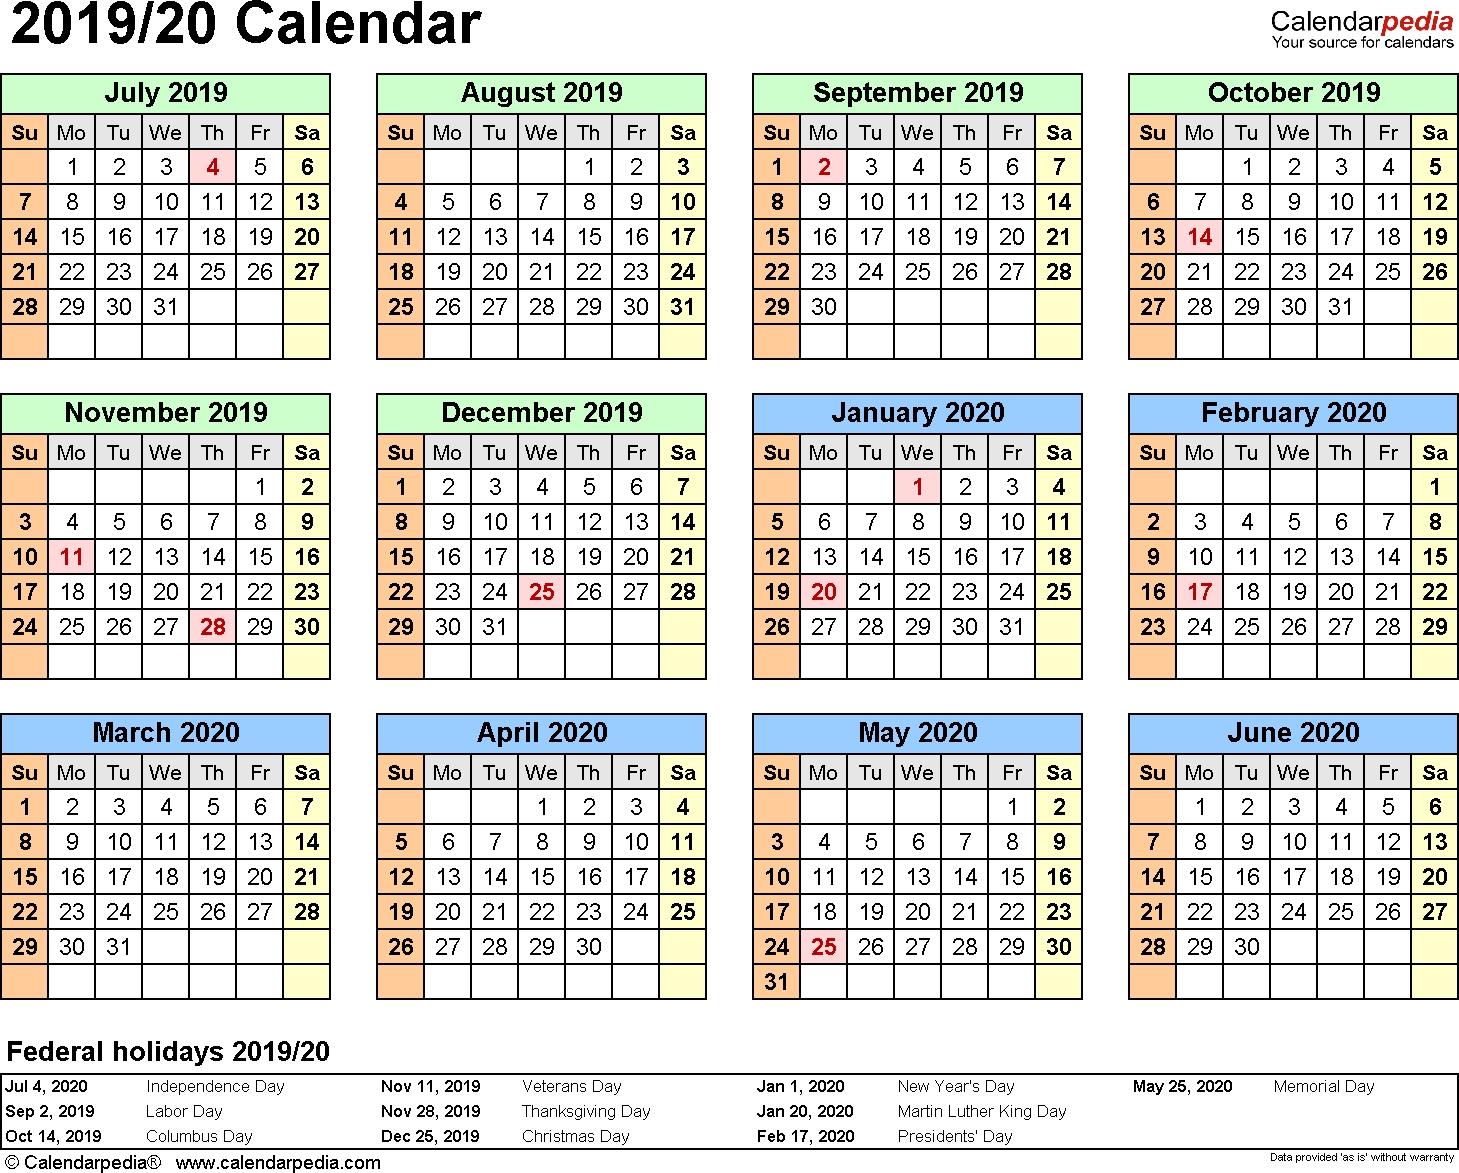 Split Year Calendar 2019/20 (July To June) - Pdf Templates regarding 2019-2020 Calendar Starting On Mondays